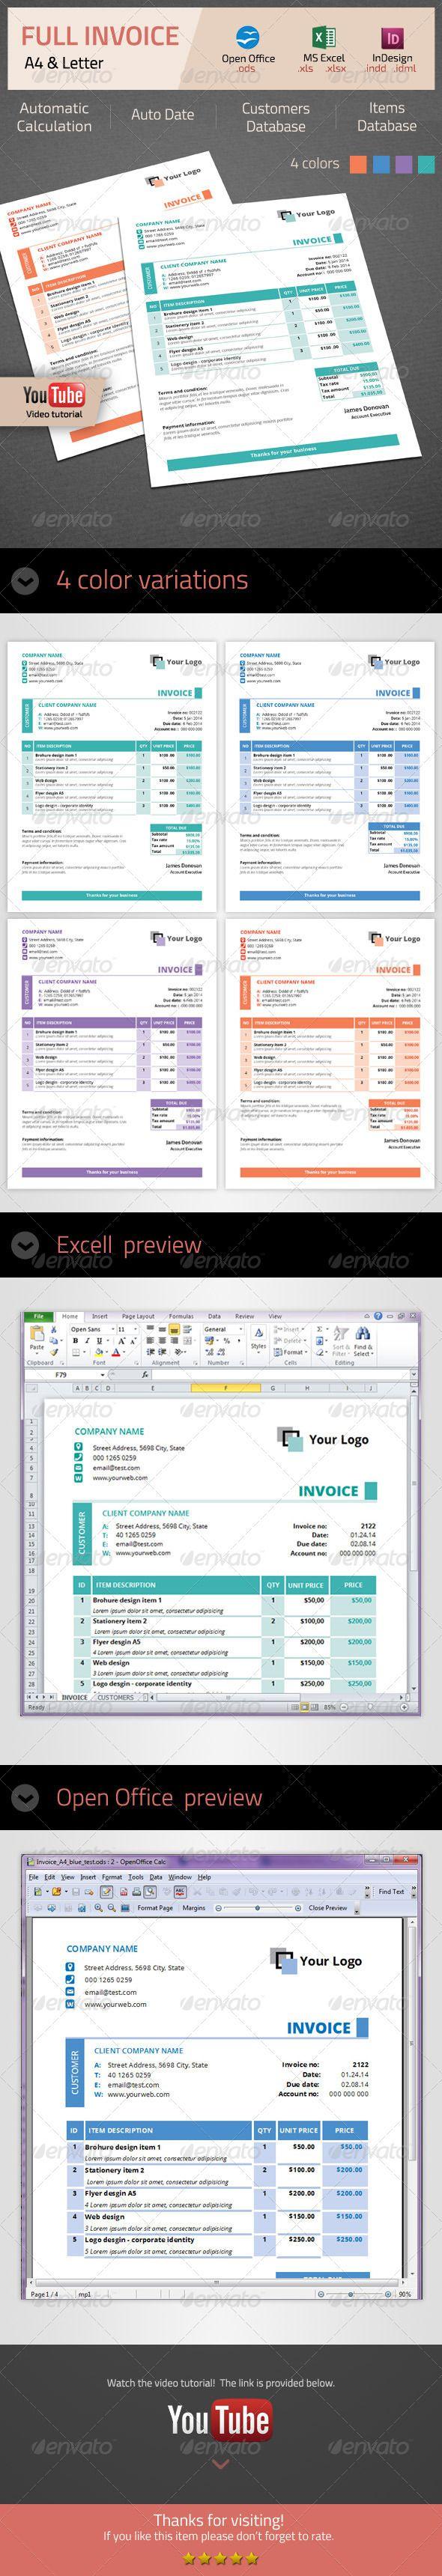 Invoice Page Classy 22 Best Invoice Design  Invoice Template  Invoice In Graphics .